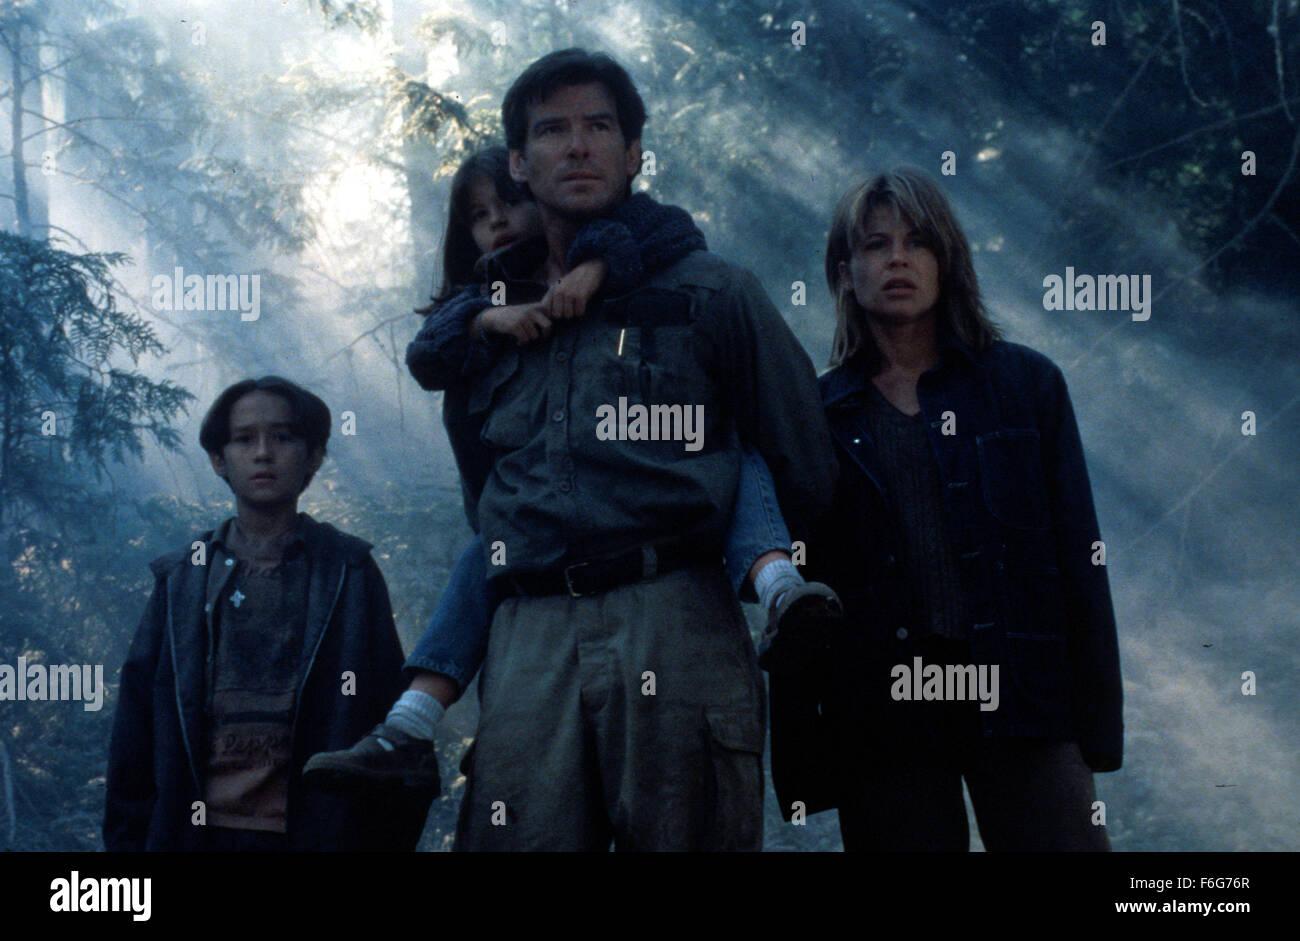 May 11, 1997; Los Angeles, CA, USA; Movie stills from 'Dante's Peak' featuring (LtoR) JEREMY FOLEY as Graham Wando, Stock Photo